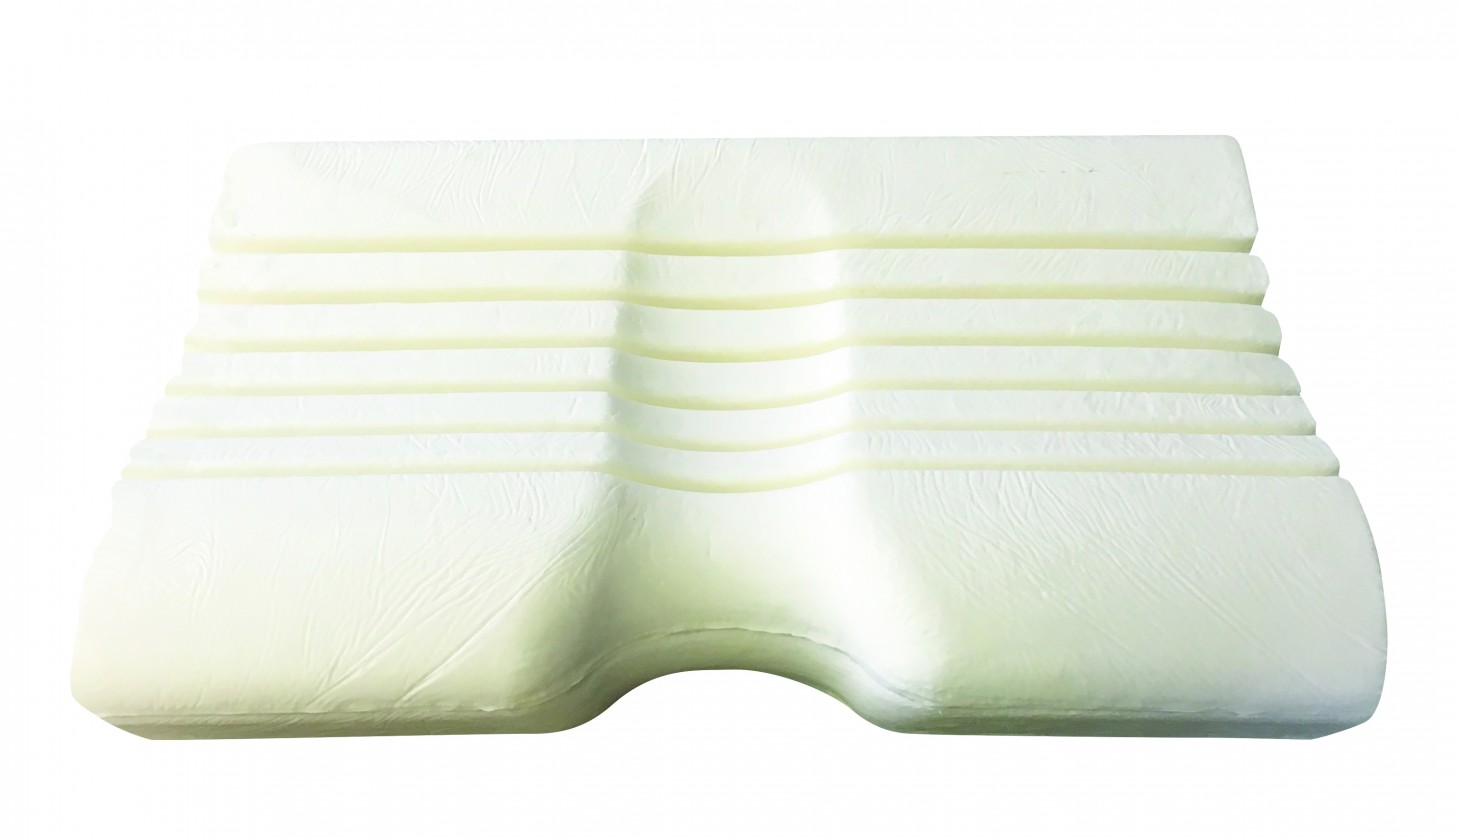 Anatomický vankúš Van - ortopedický vankúš, Visco lenivá pena, 53x33x11